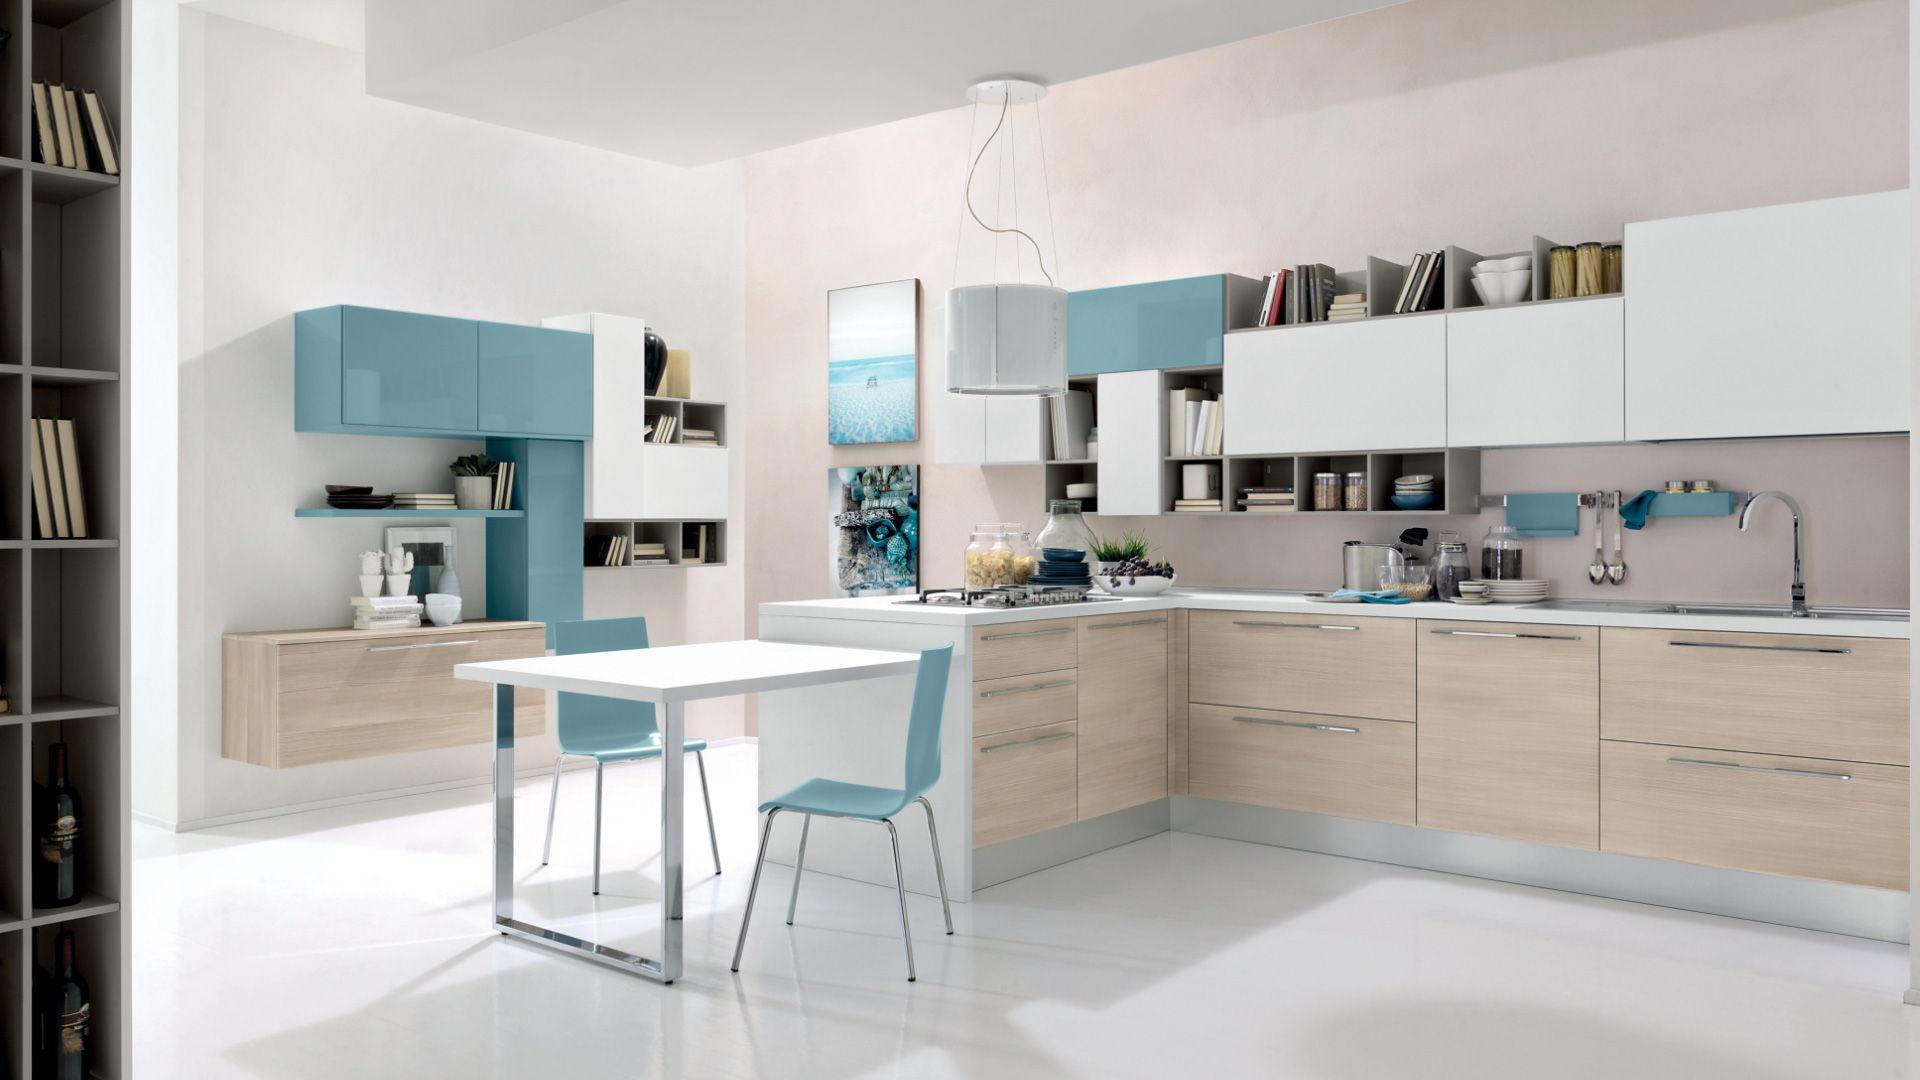 SWING - GranCasa | Cucine moderne, Decorazione cucina, Progetti di ...